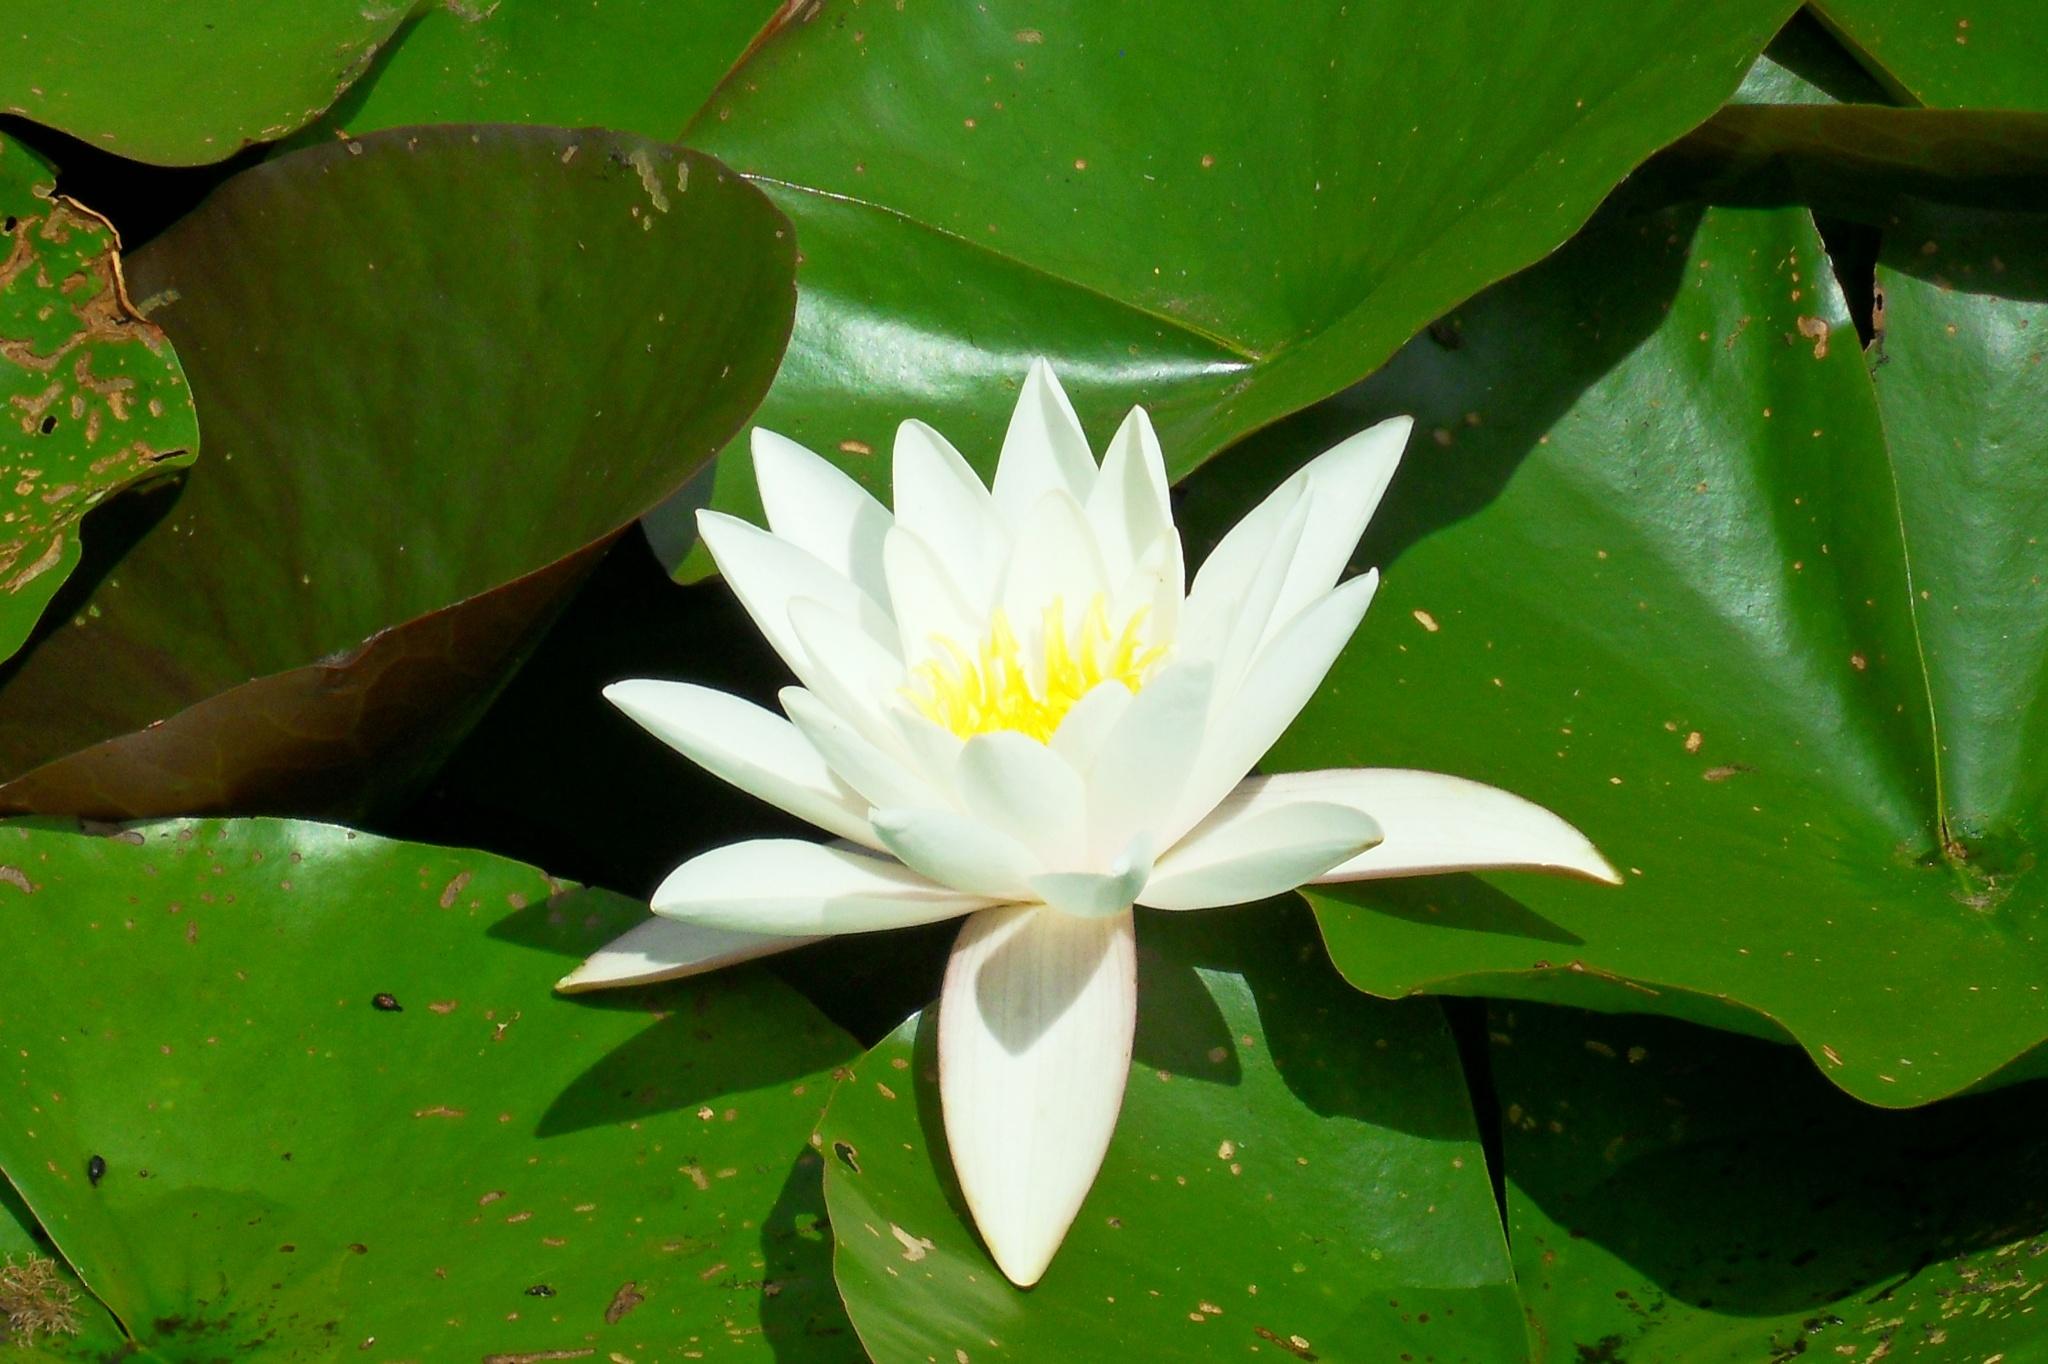 Water lily by Barbara Bumm